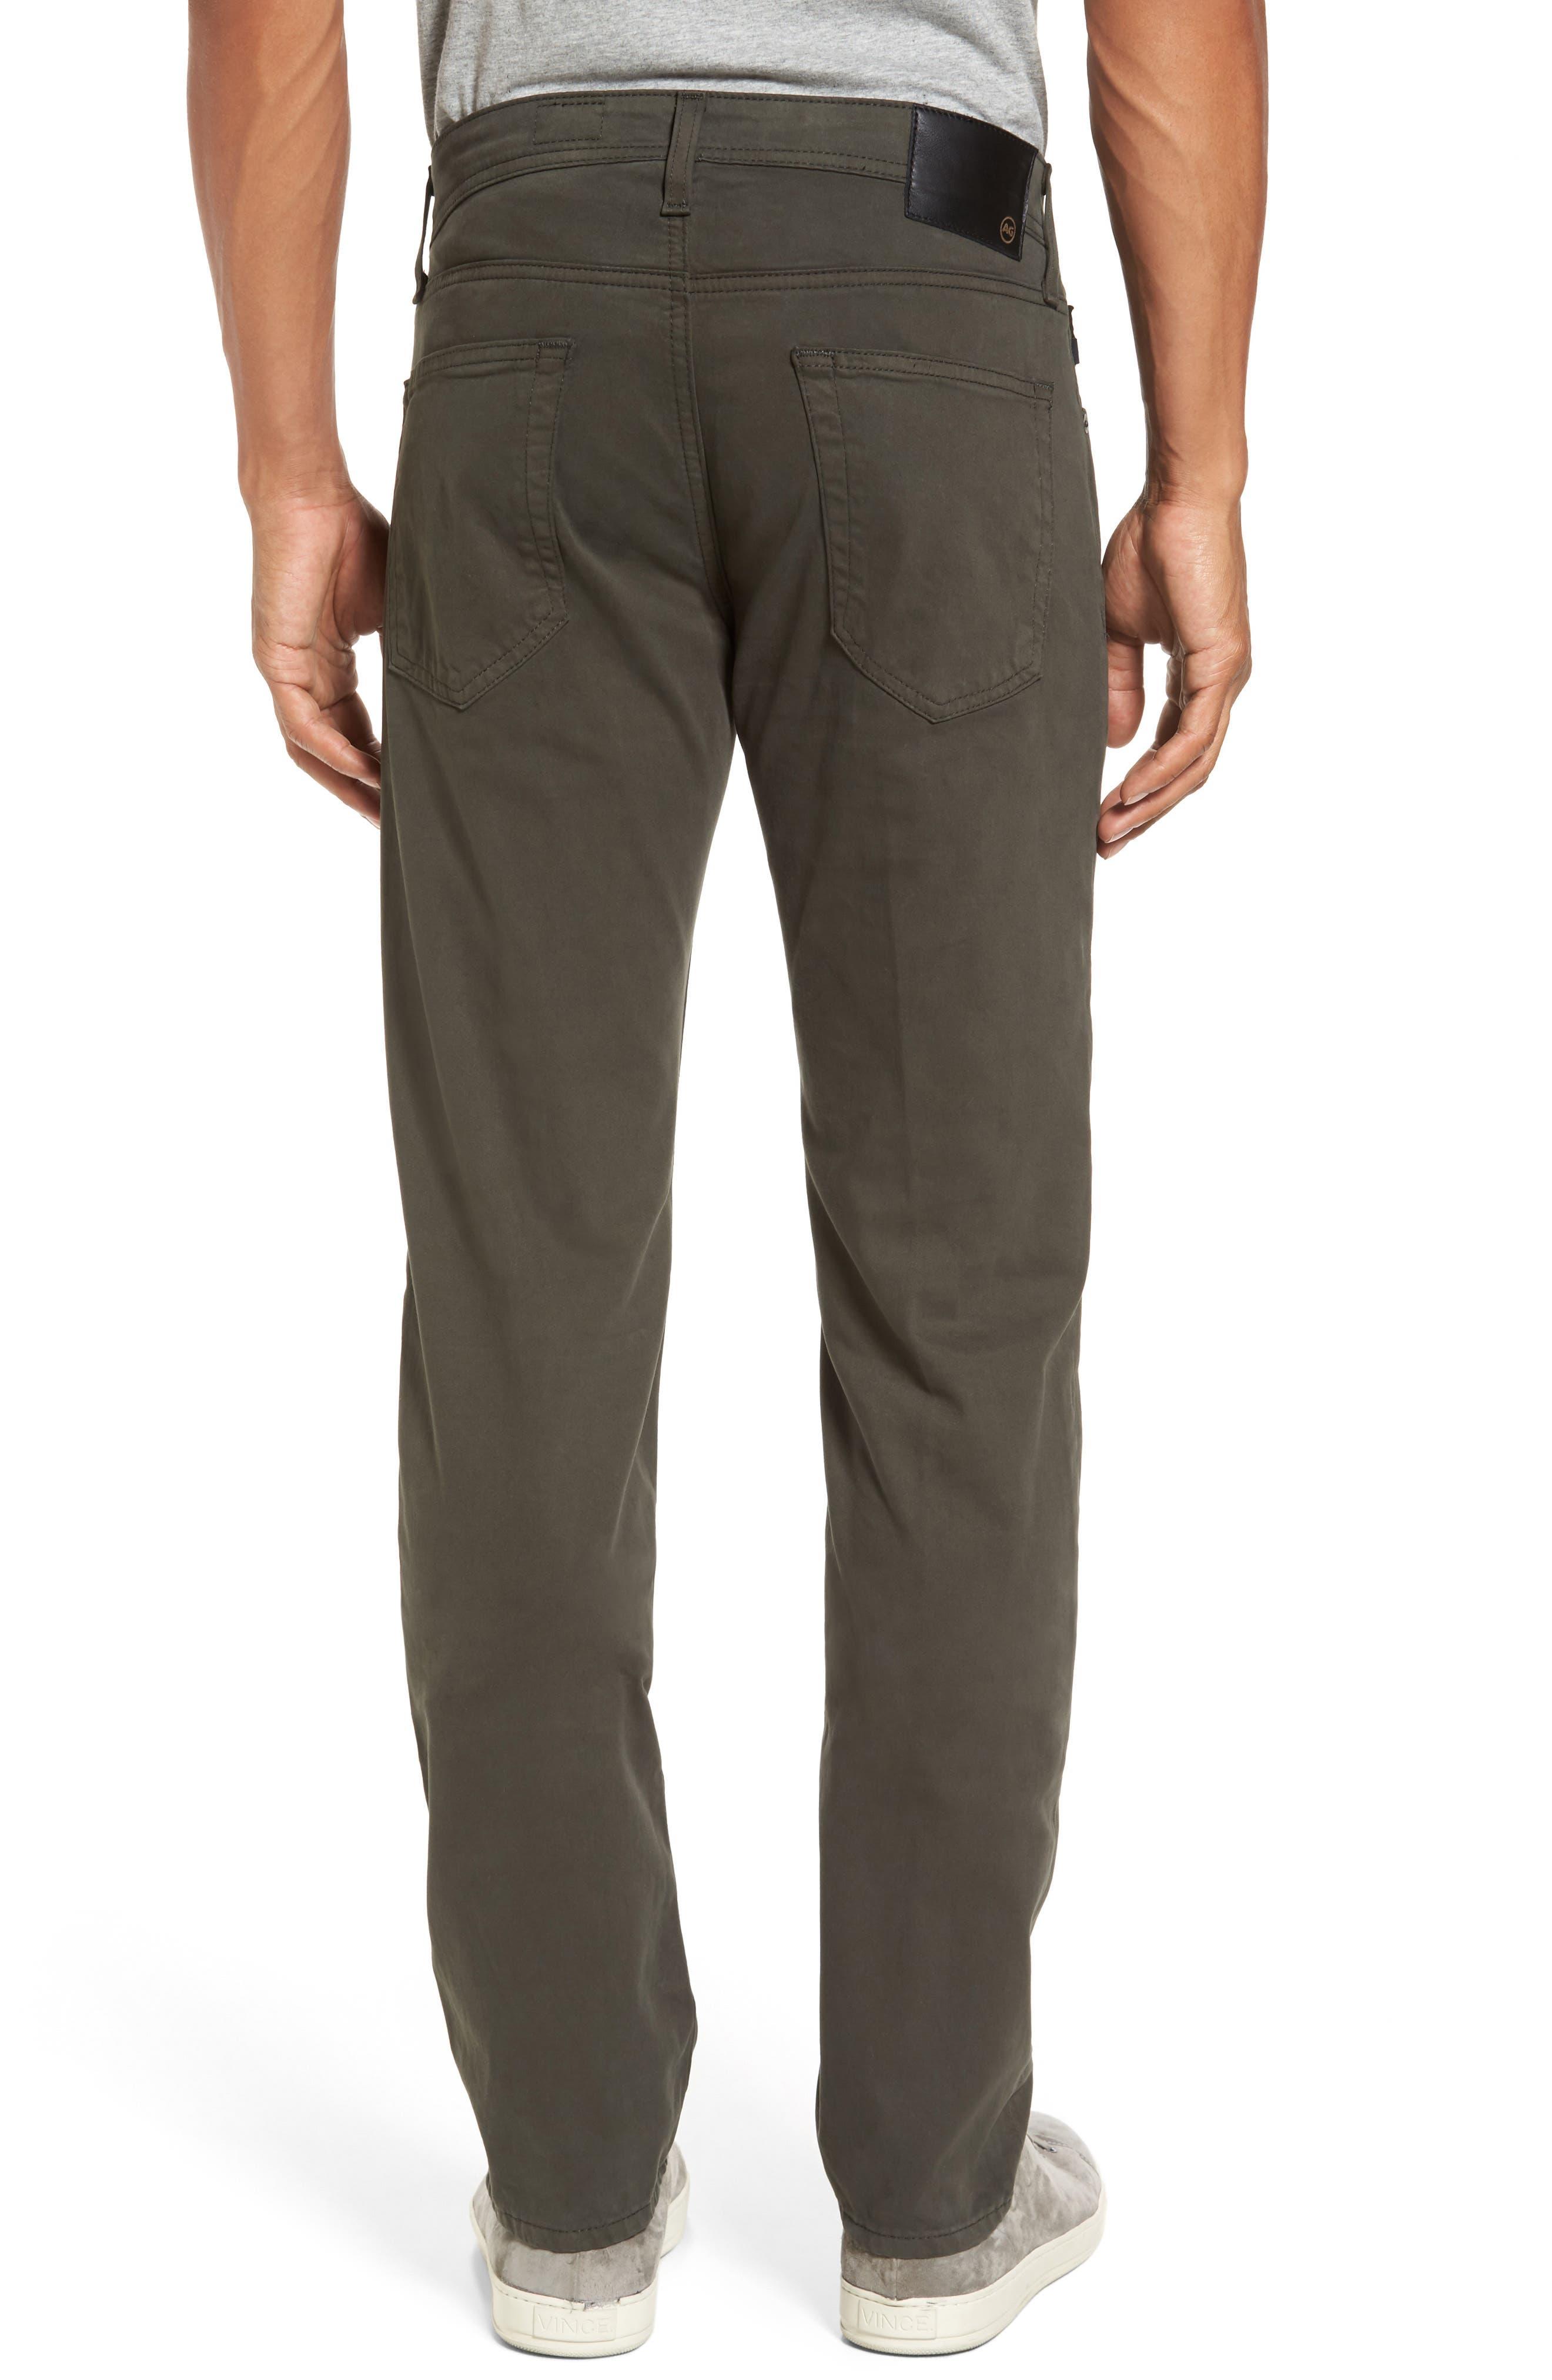 Tellis SUD Modern Slim Stretch Twill Pants,                             Alternate thumbnail 2, color,                             Green Forest